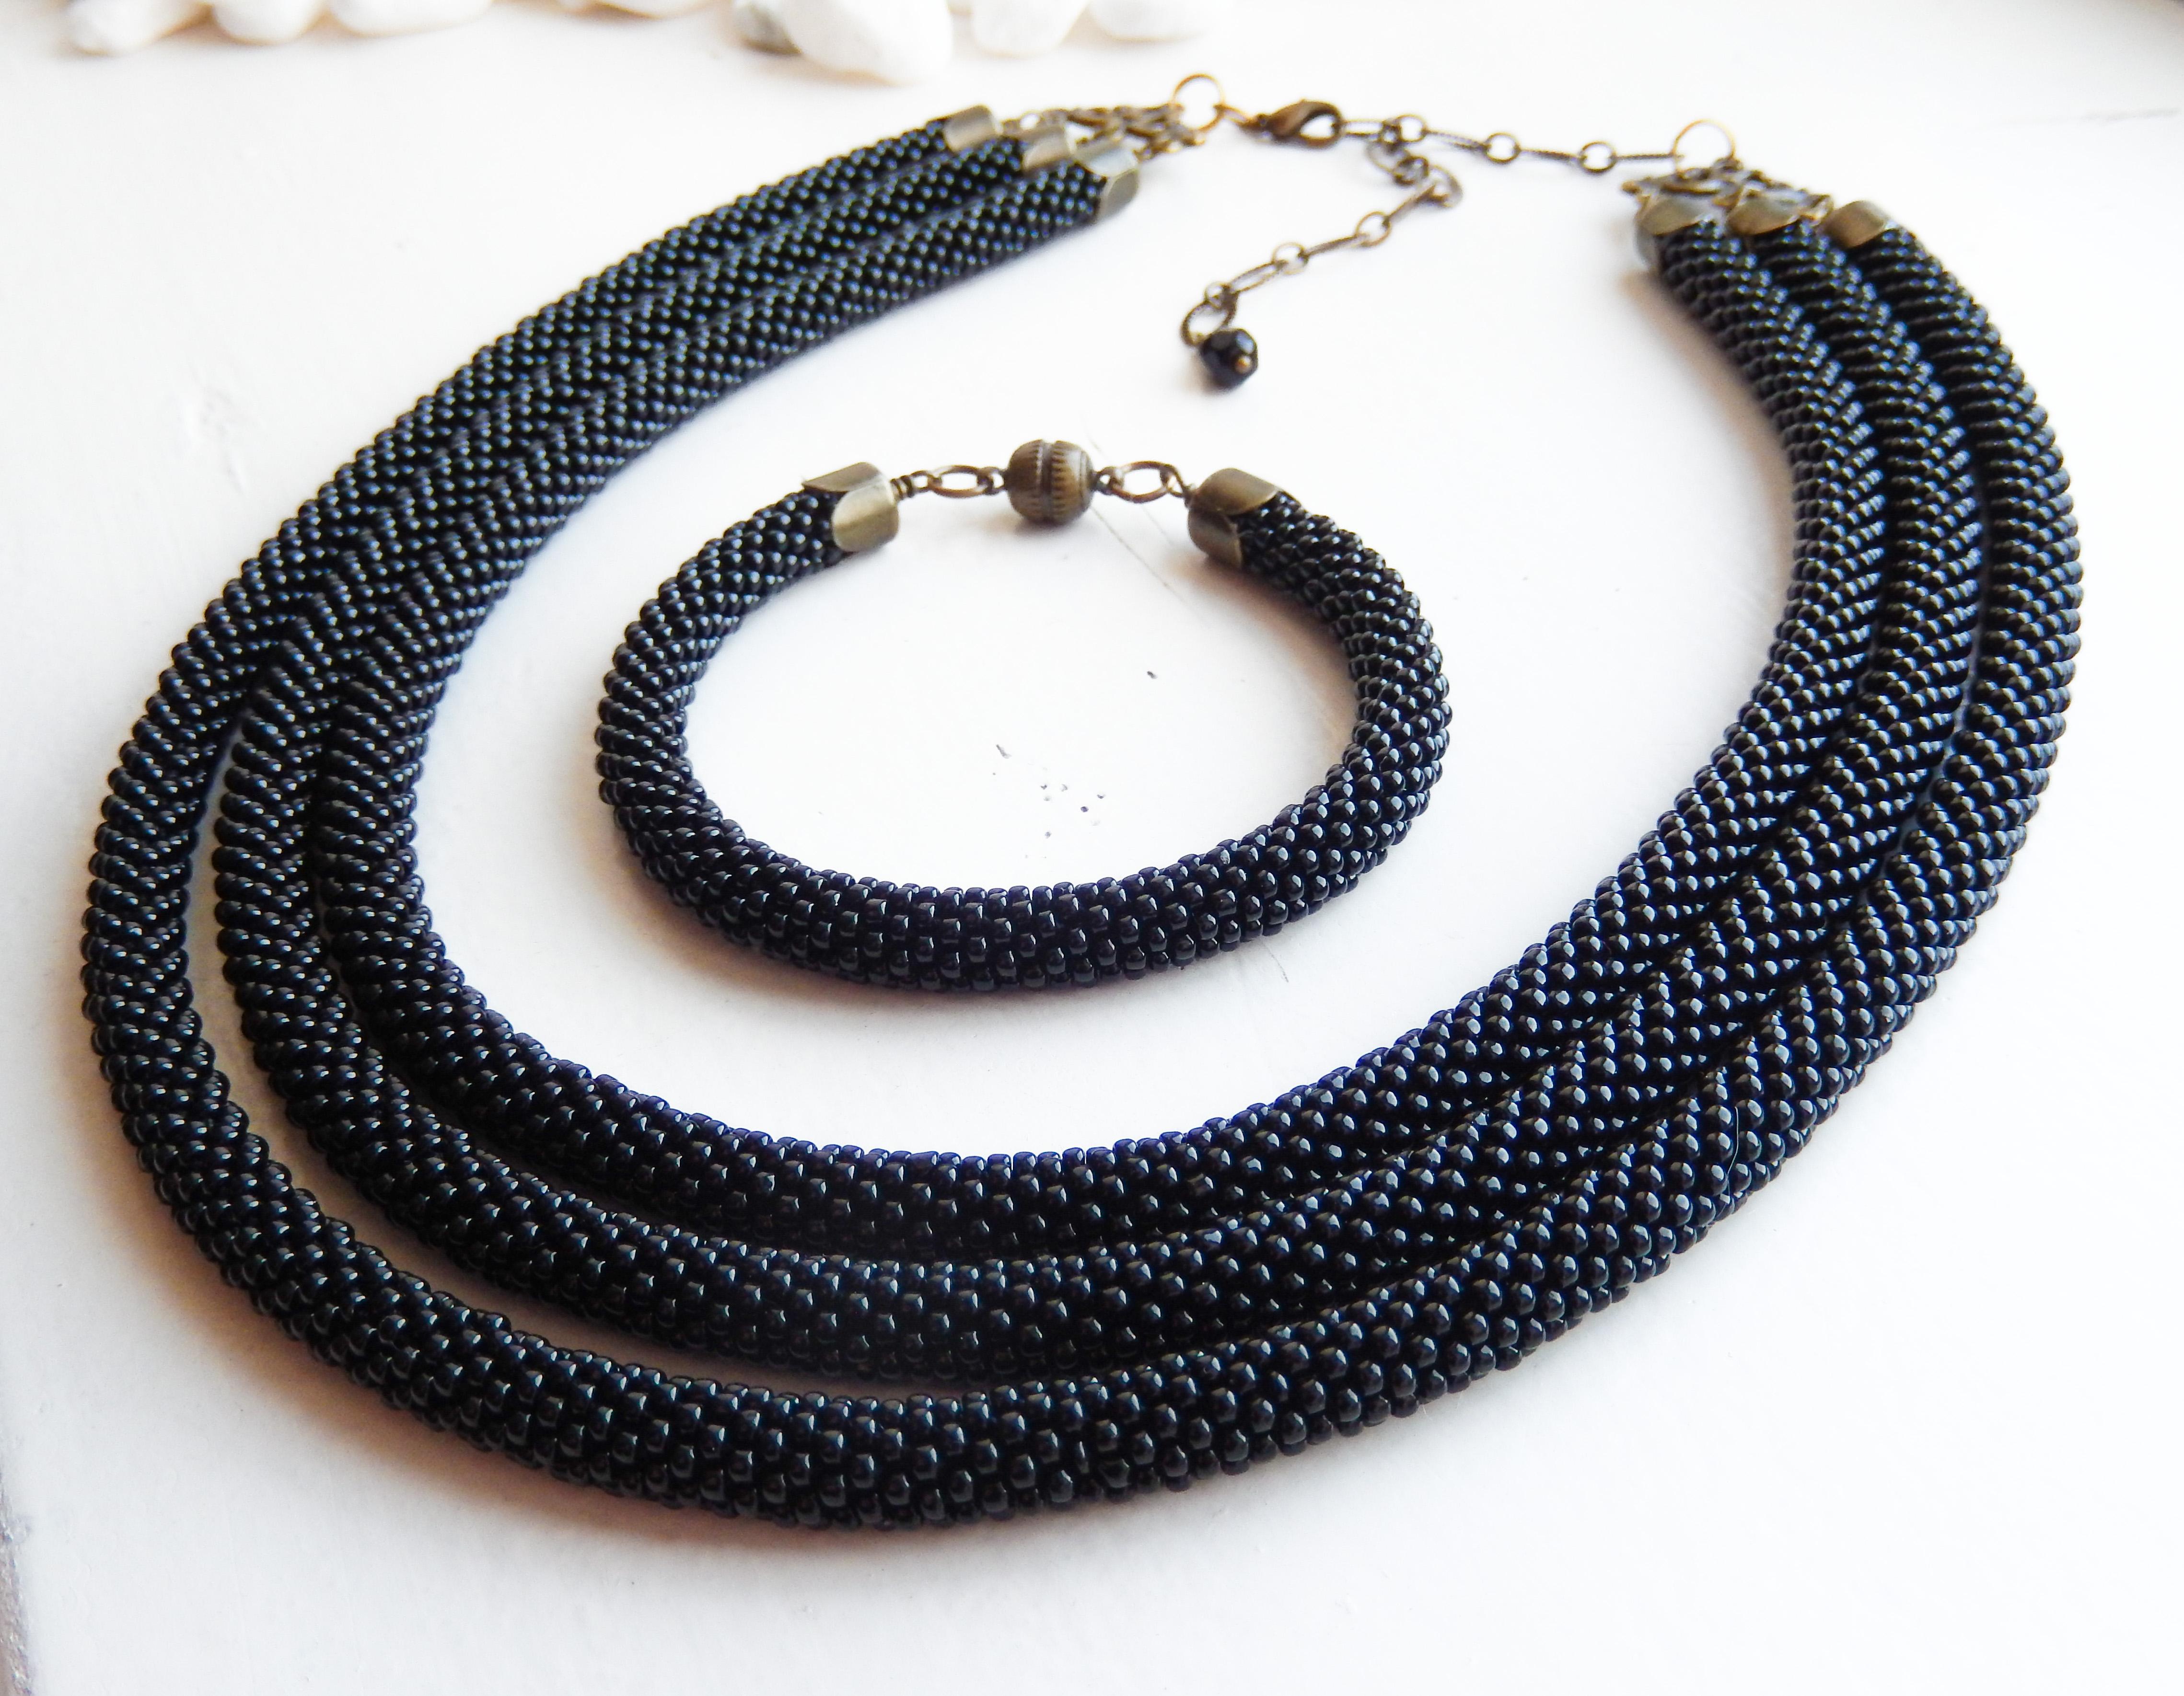 Bead Crochet Necklace & Bracelet